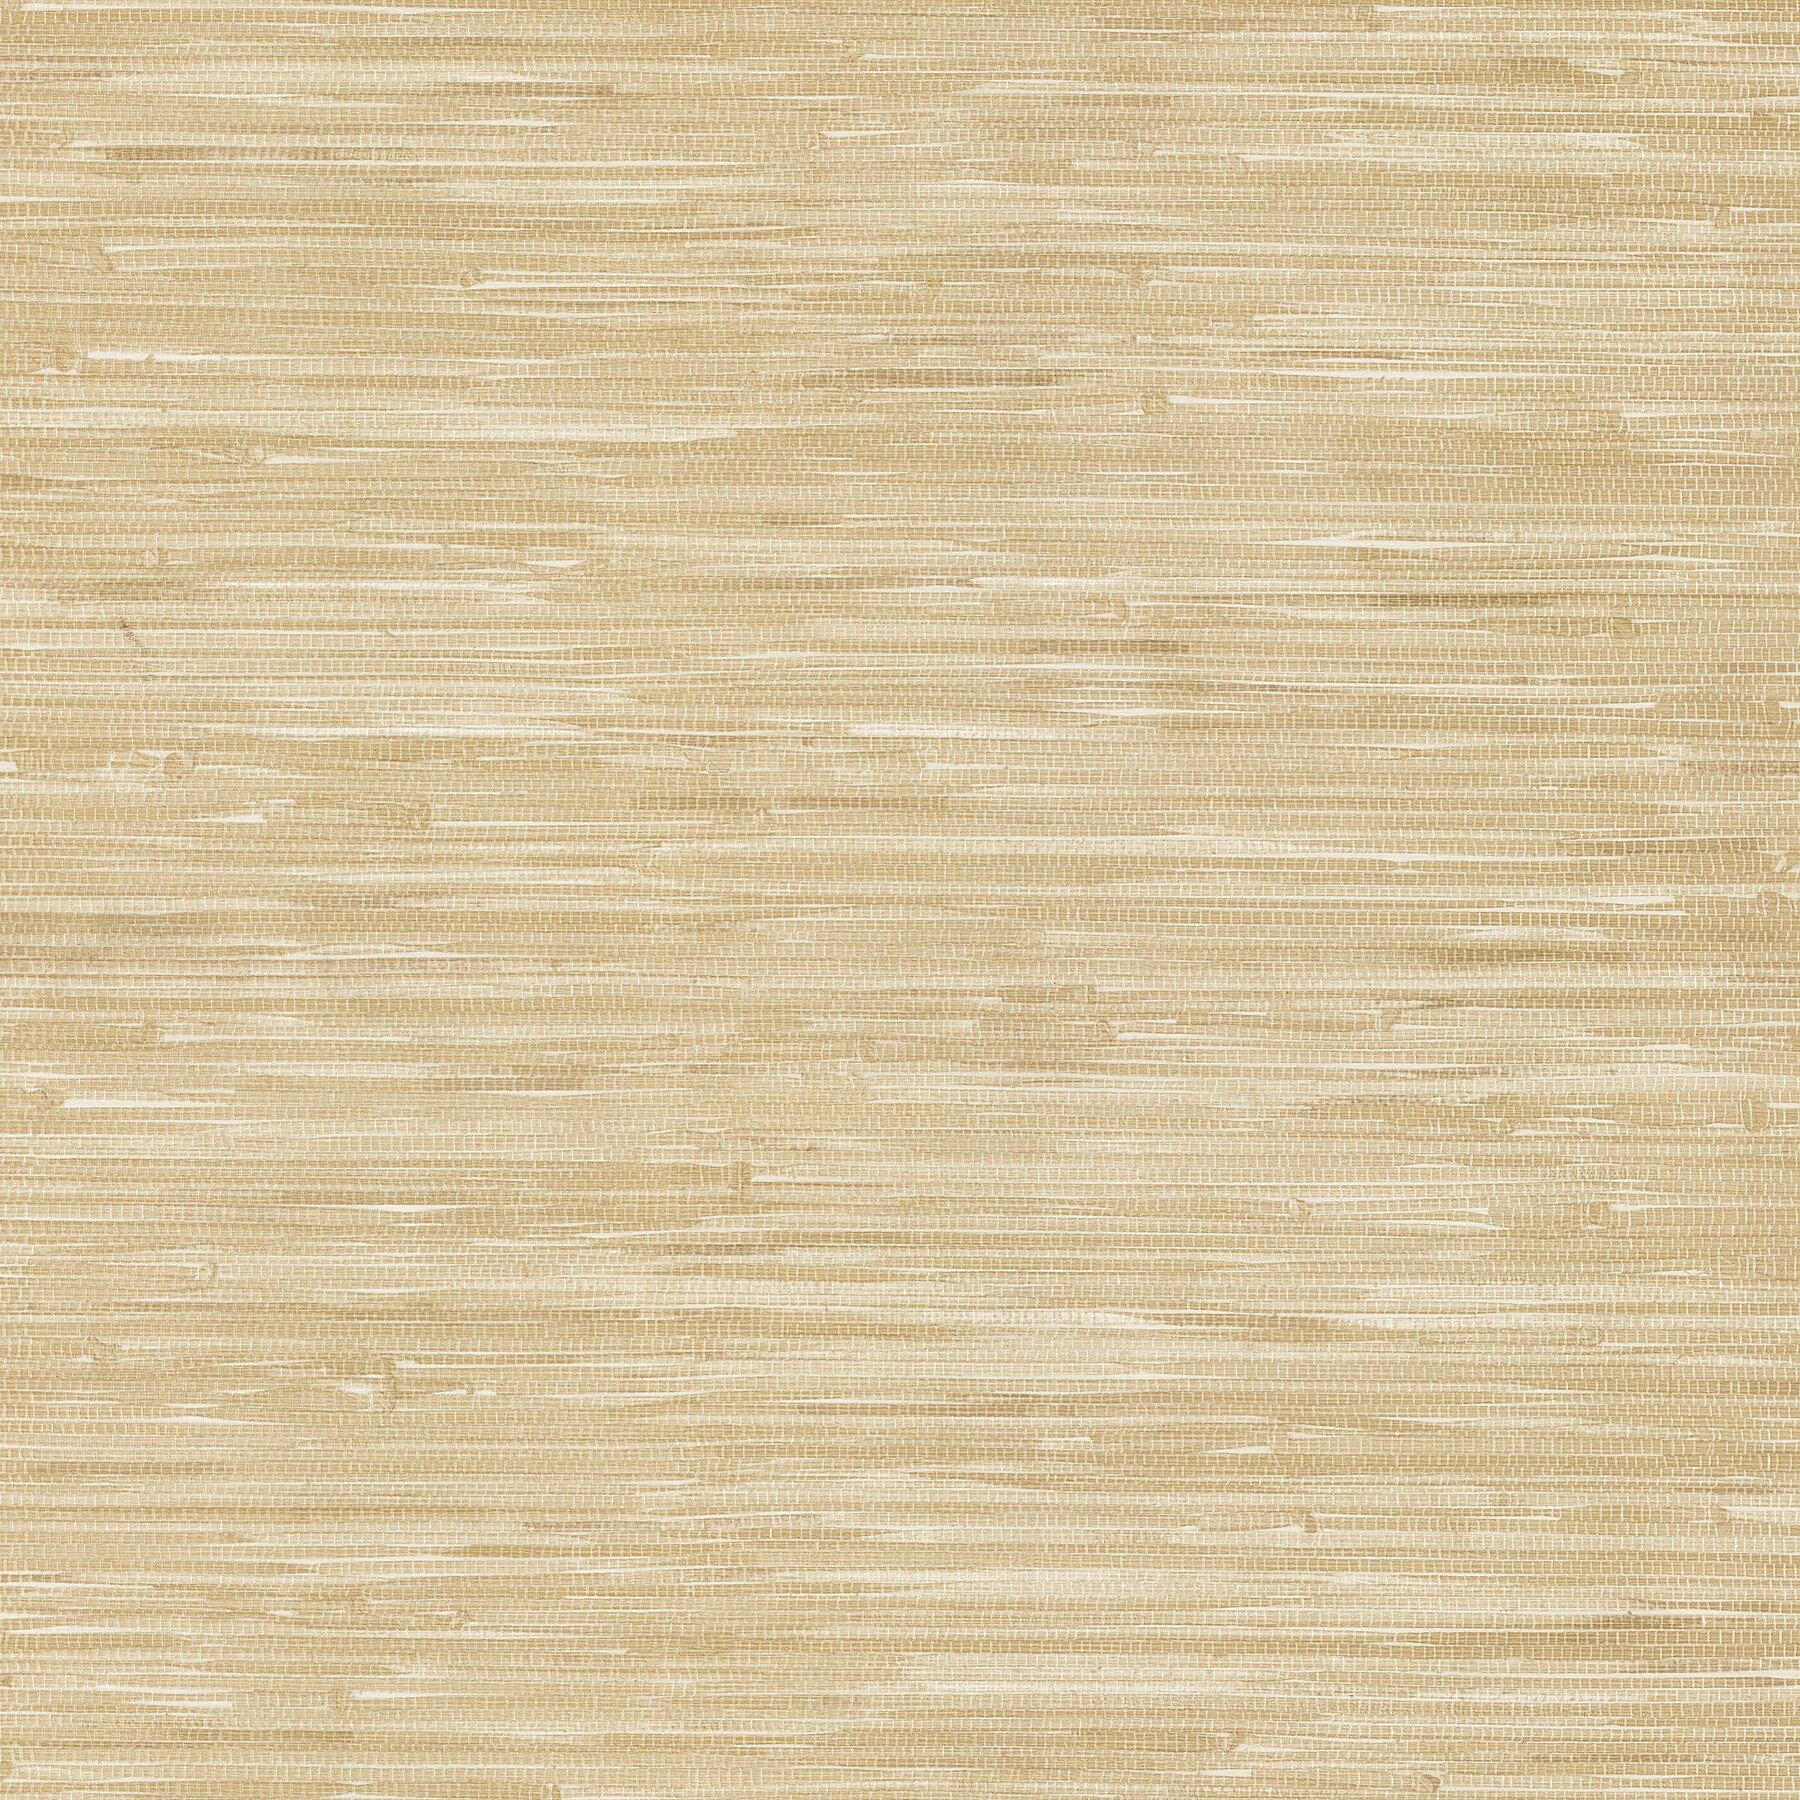 Brewster Home Fashions Liu 33u0027 x 20.5 Vinyl Grasscloth Wallpaper